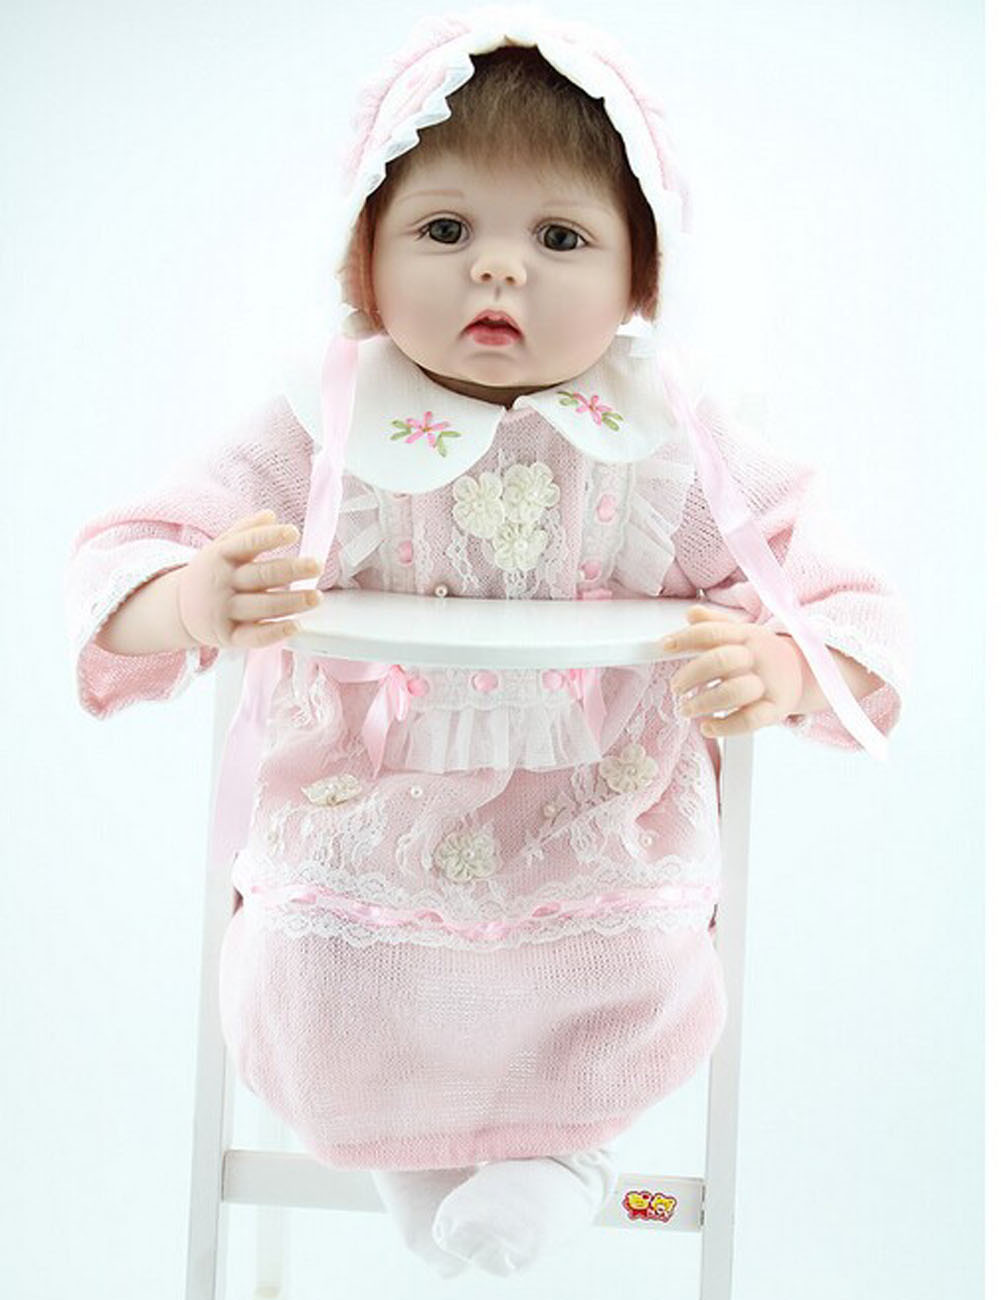 Realistic Reborn Fake Babies Soft Vinyl Girl Doll